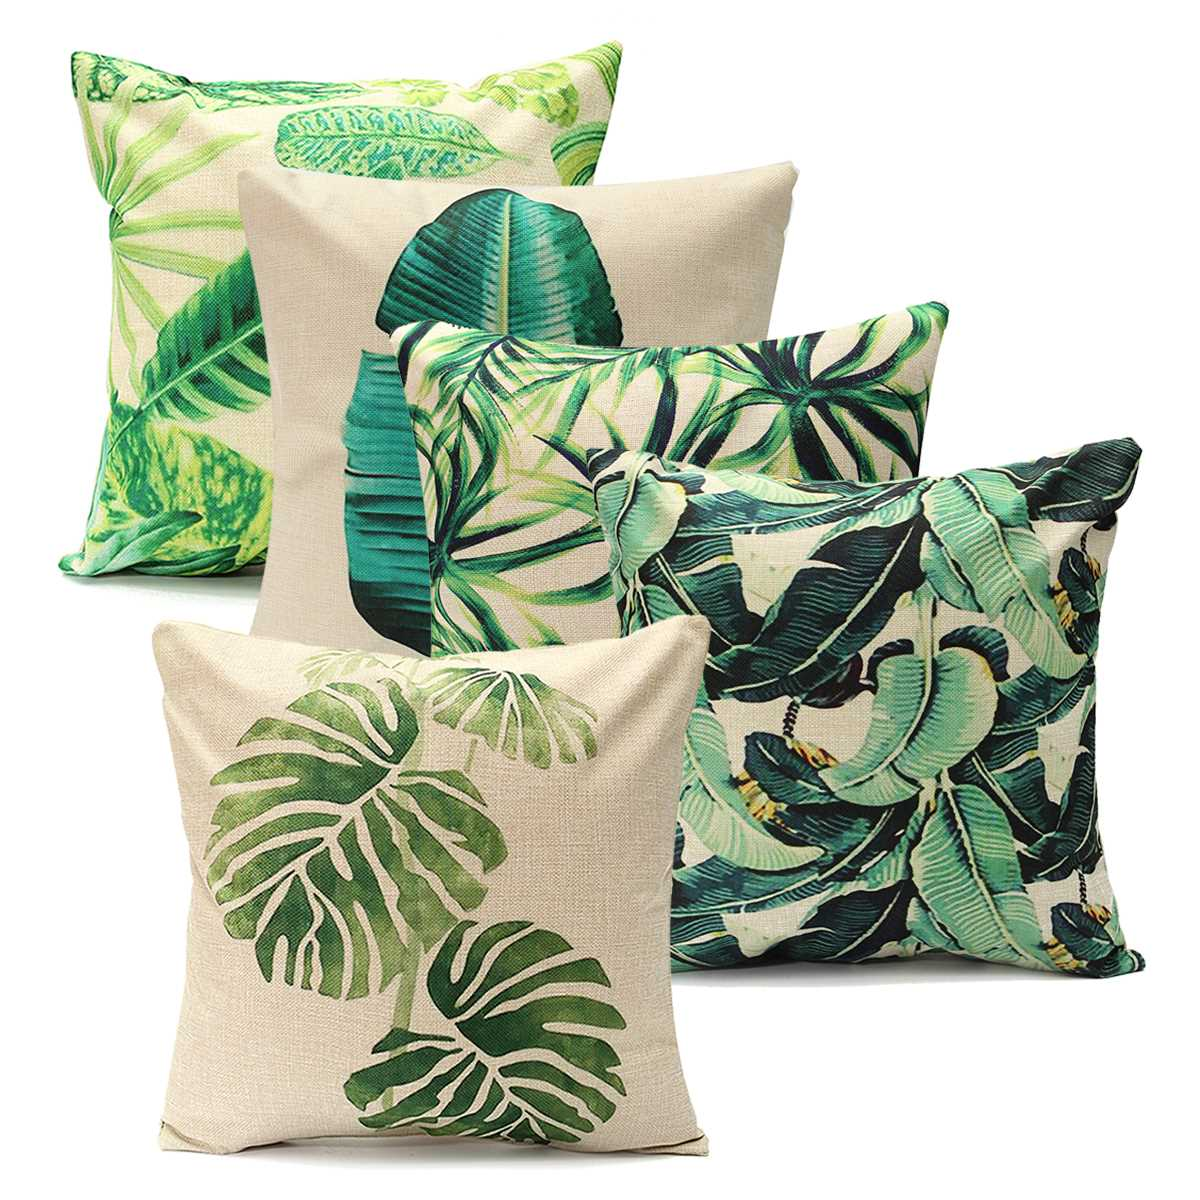 Pillowcases Green Leaf Cotton Linen Cushion Pillow Cover Waist Throw Case Home Bed Beauty Comfortable Pillow Sham